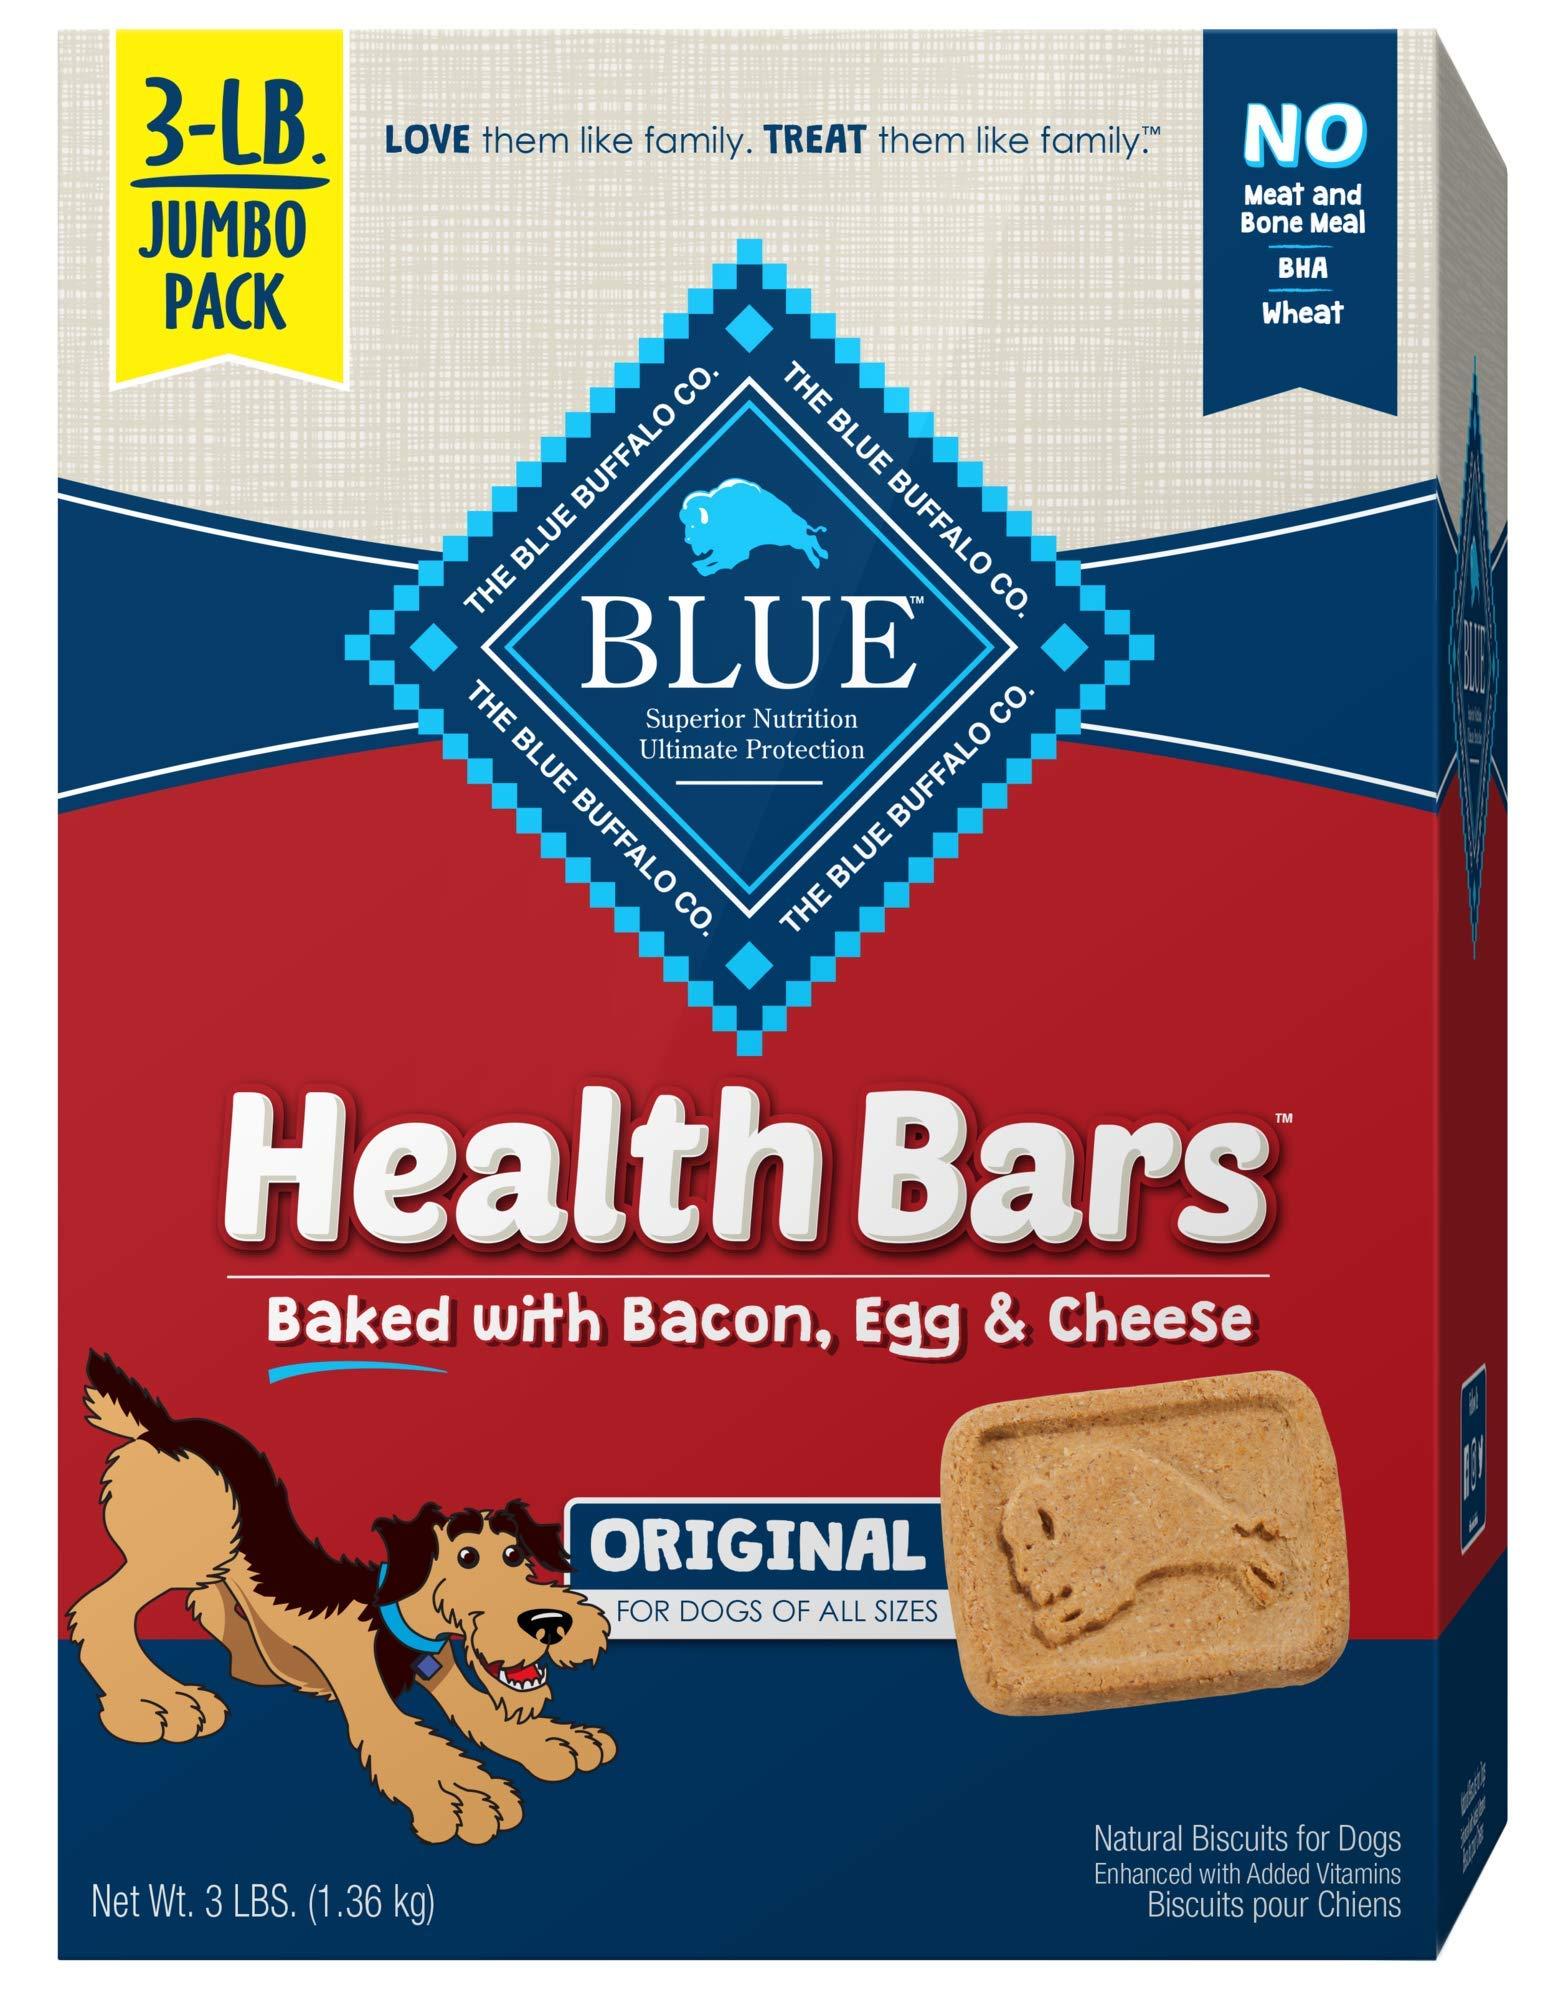 Blue Buffalo Health Bars Natural Crunchy Dog Treats Biscuits, Bacon, Egg & Cheese 48-oz Box by Blue Buffalo